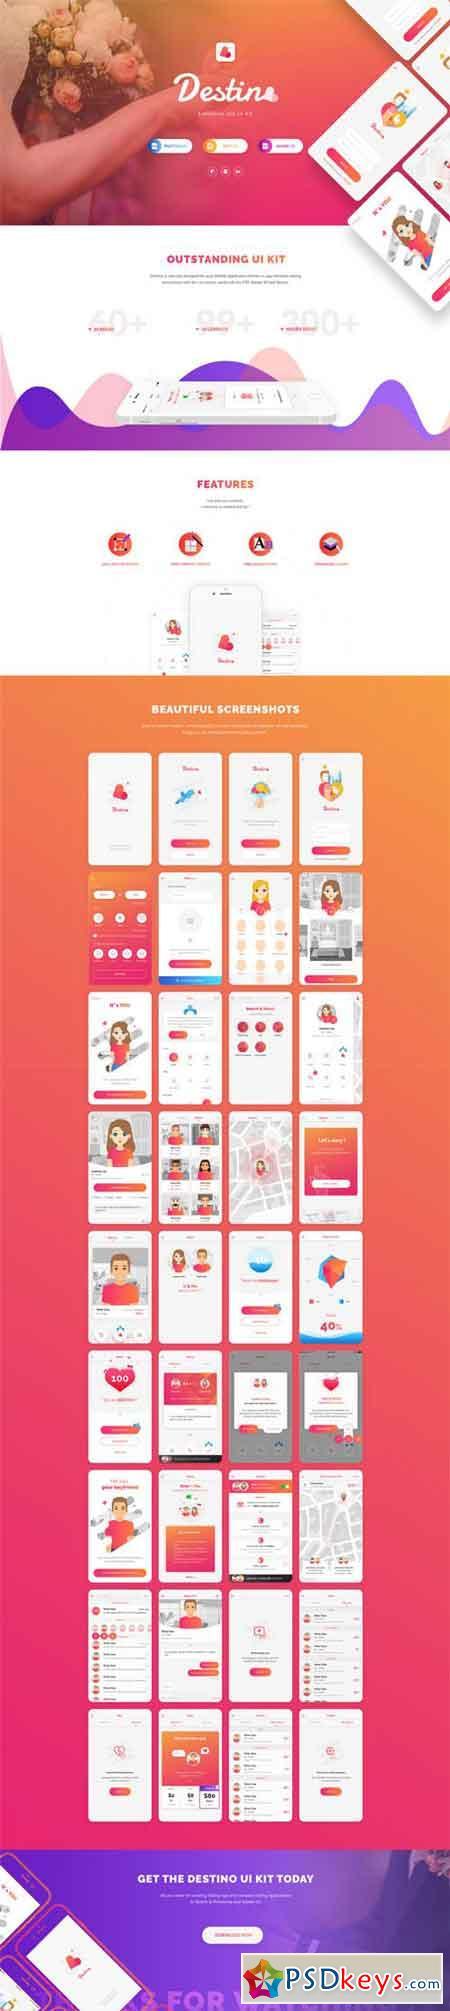 free download dating app